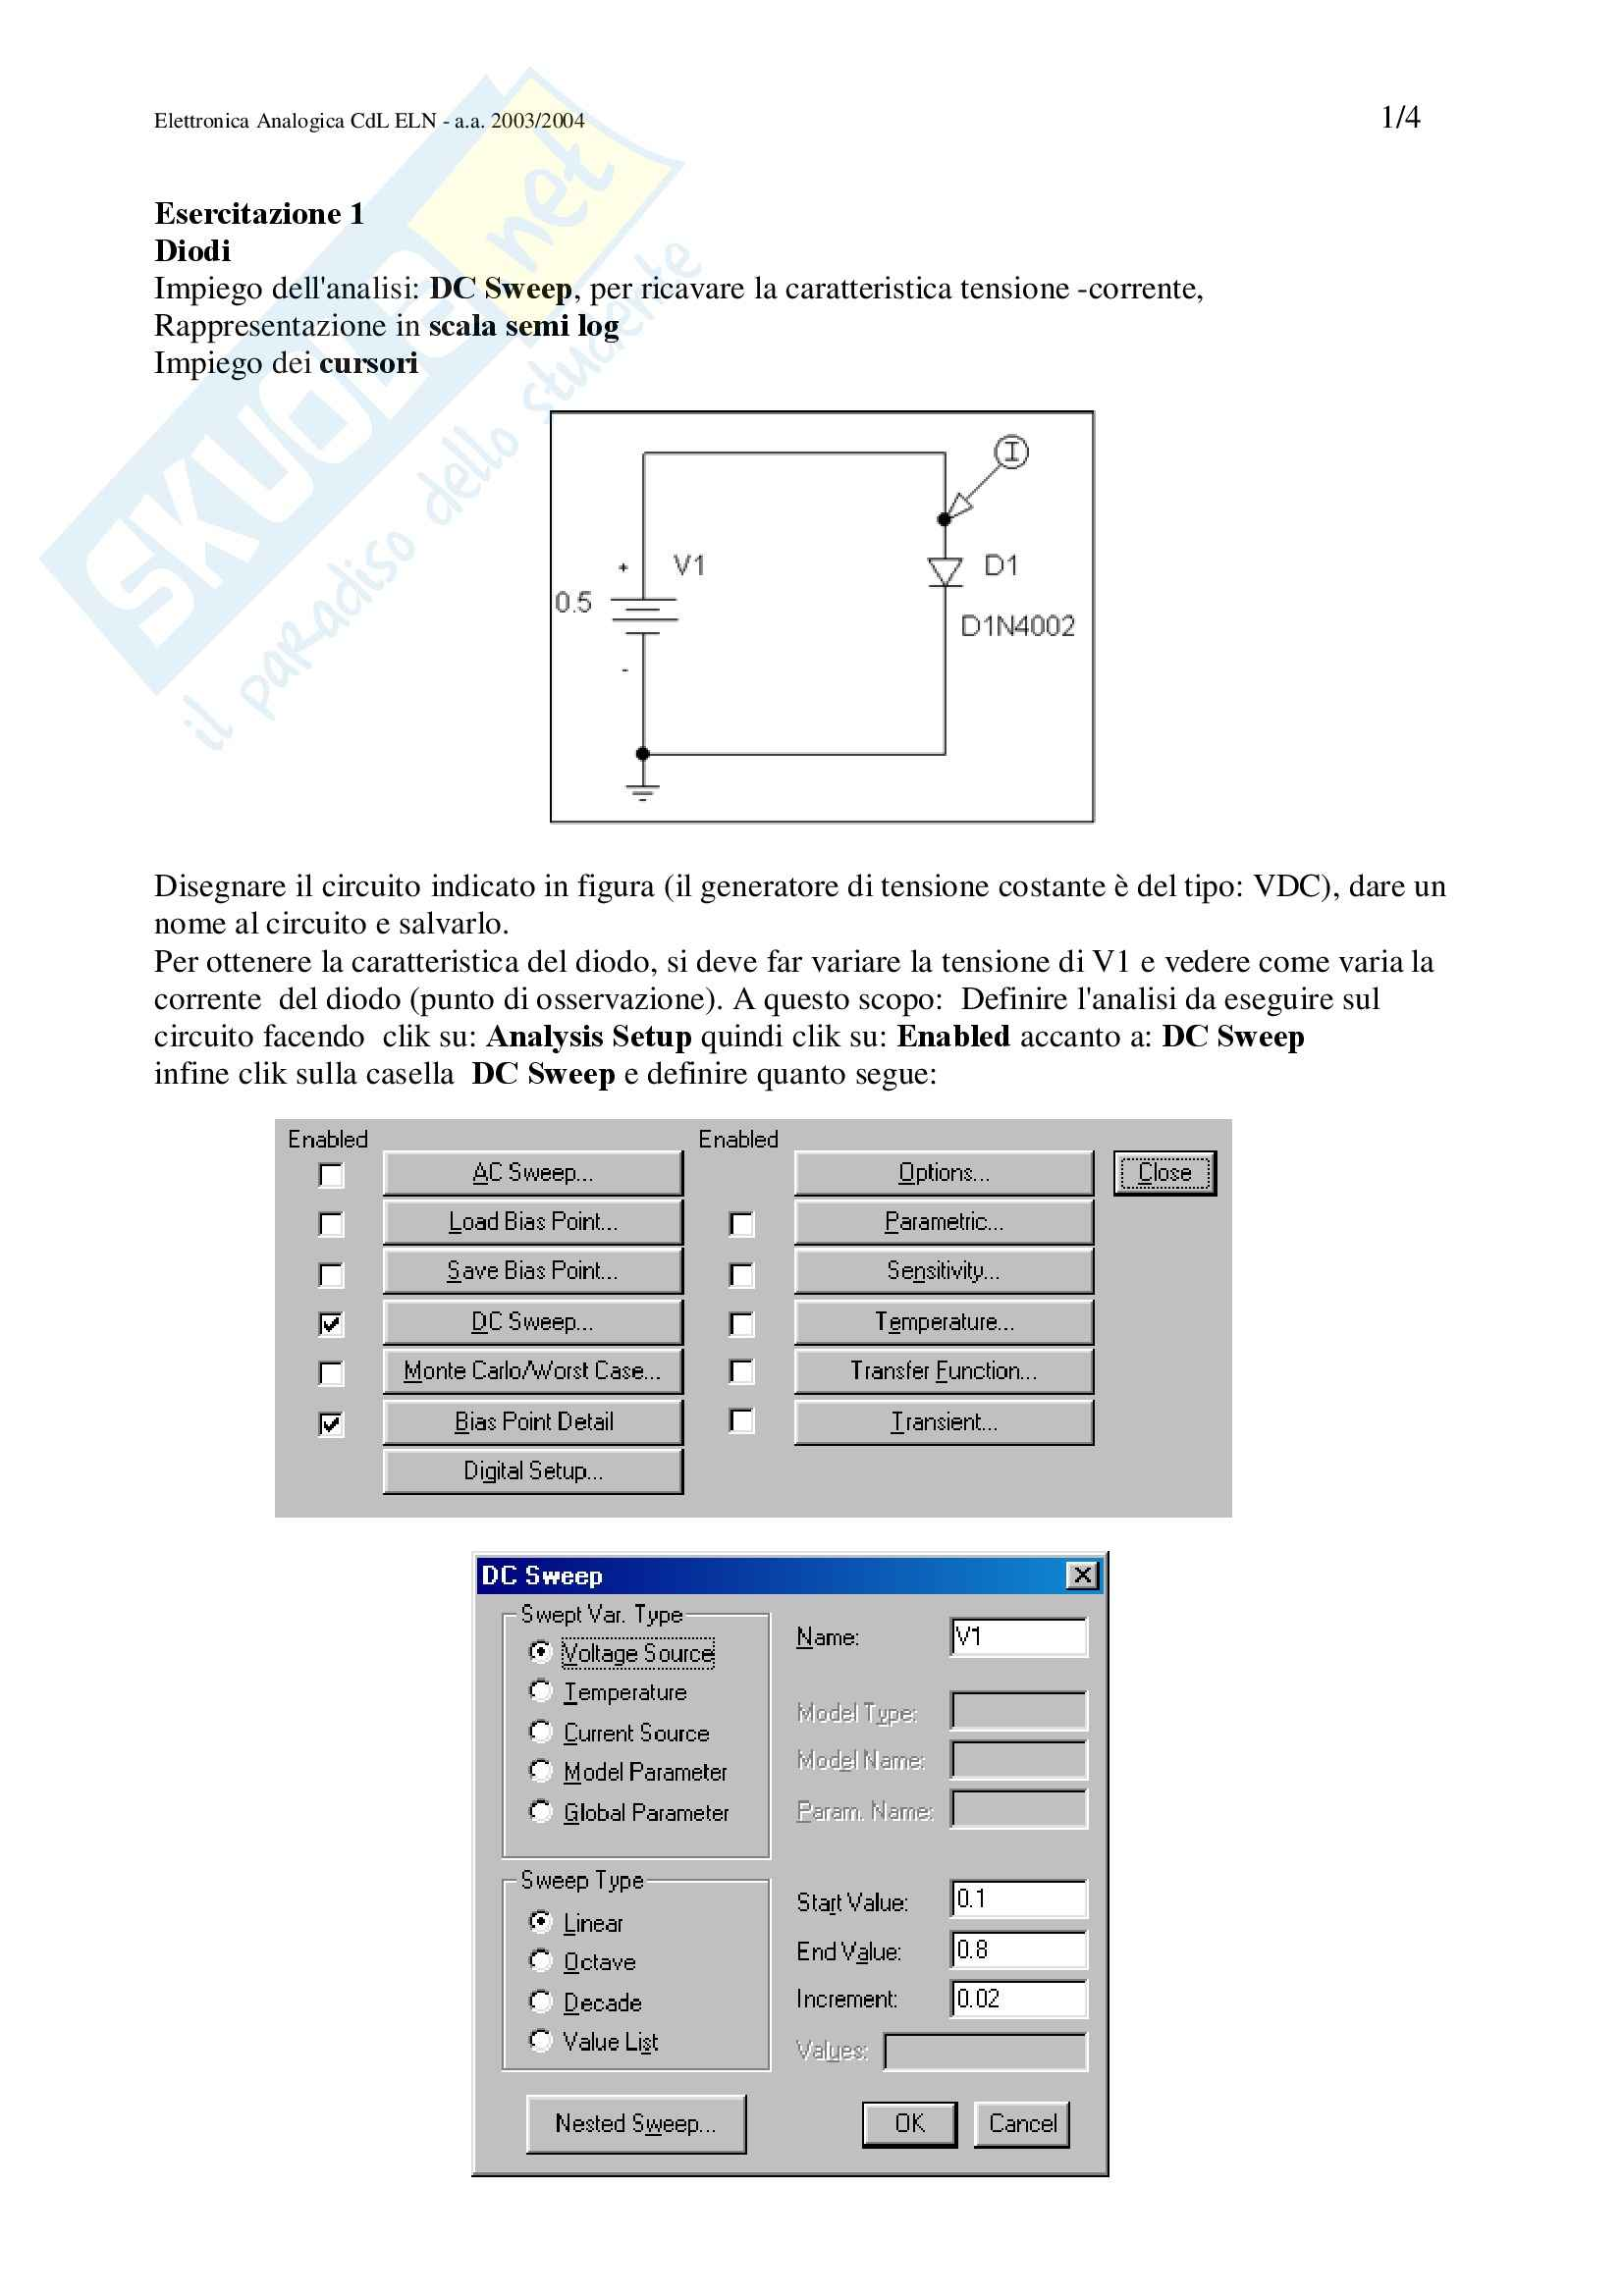 Elettronica analogica - Esercitazione